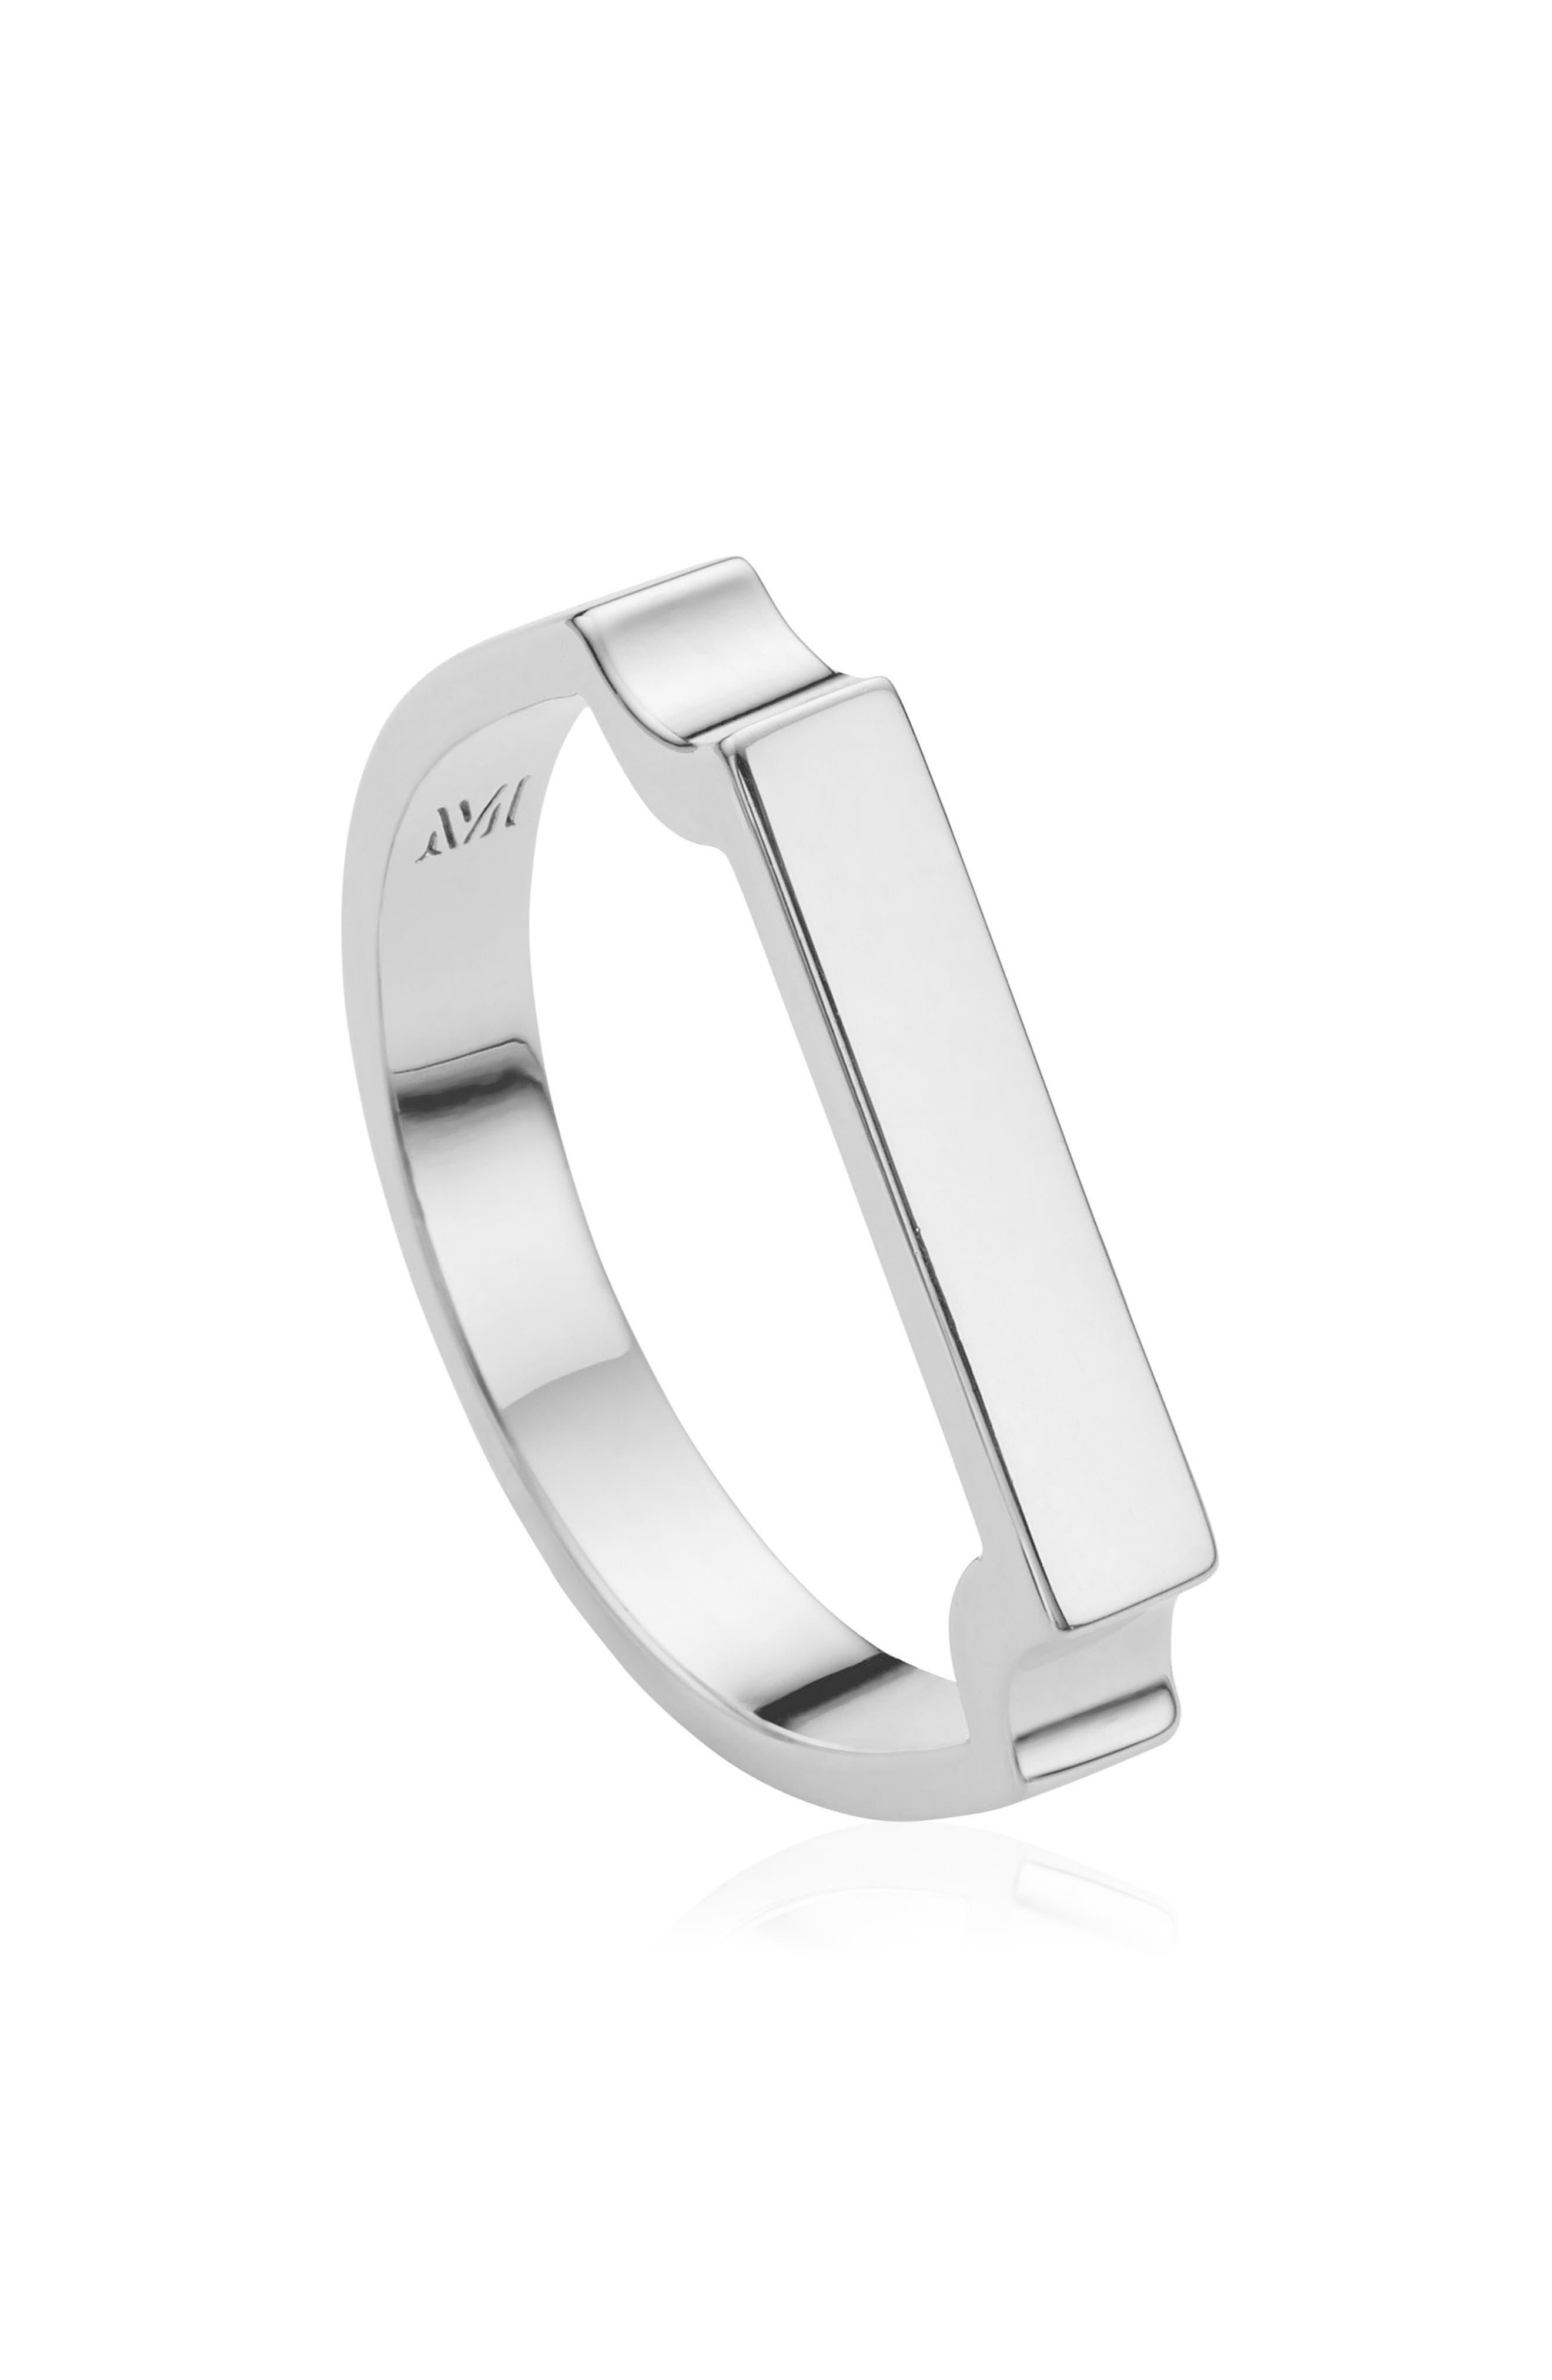 Signature Ring,                             Alternate thumbnail 3, color,                             SILVER